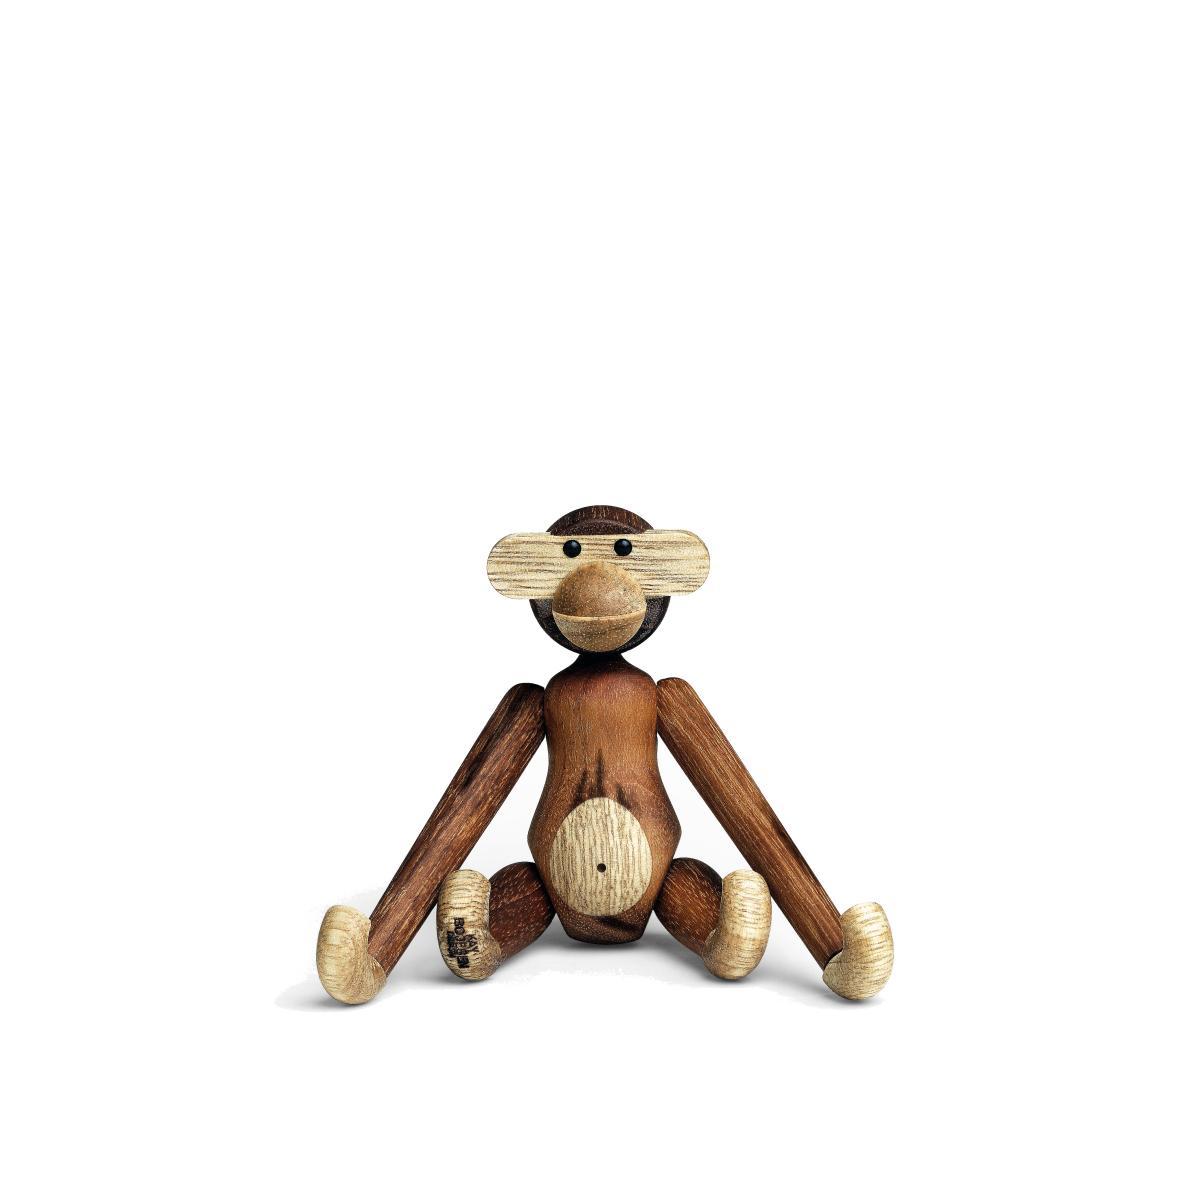 Kay Bojesen: Holz Affe 9,5 cm, Teakholz/Limba, der Mini-Affe